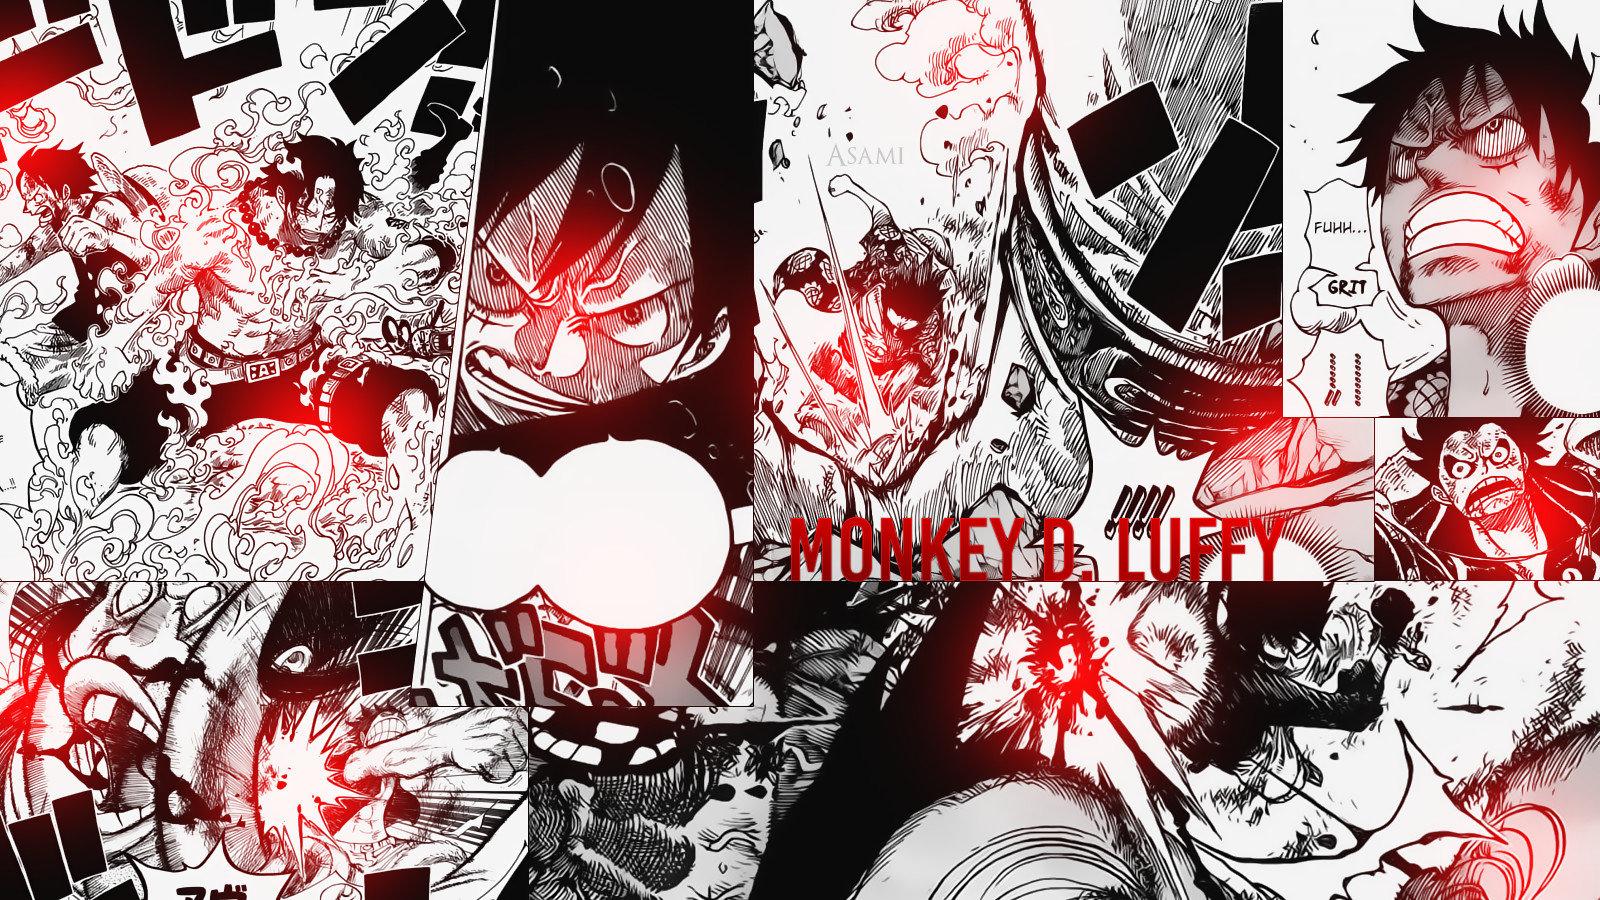 Fondos De Pantalla De One Piece Fondosmil